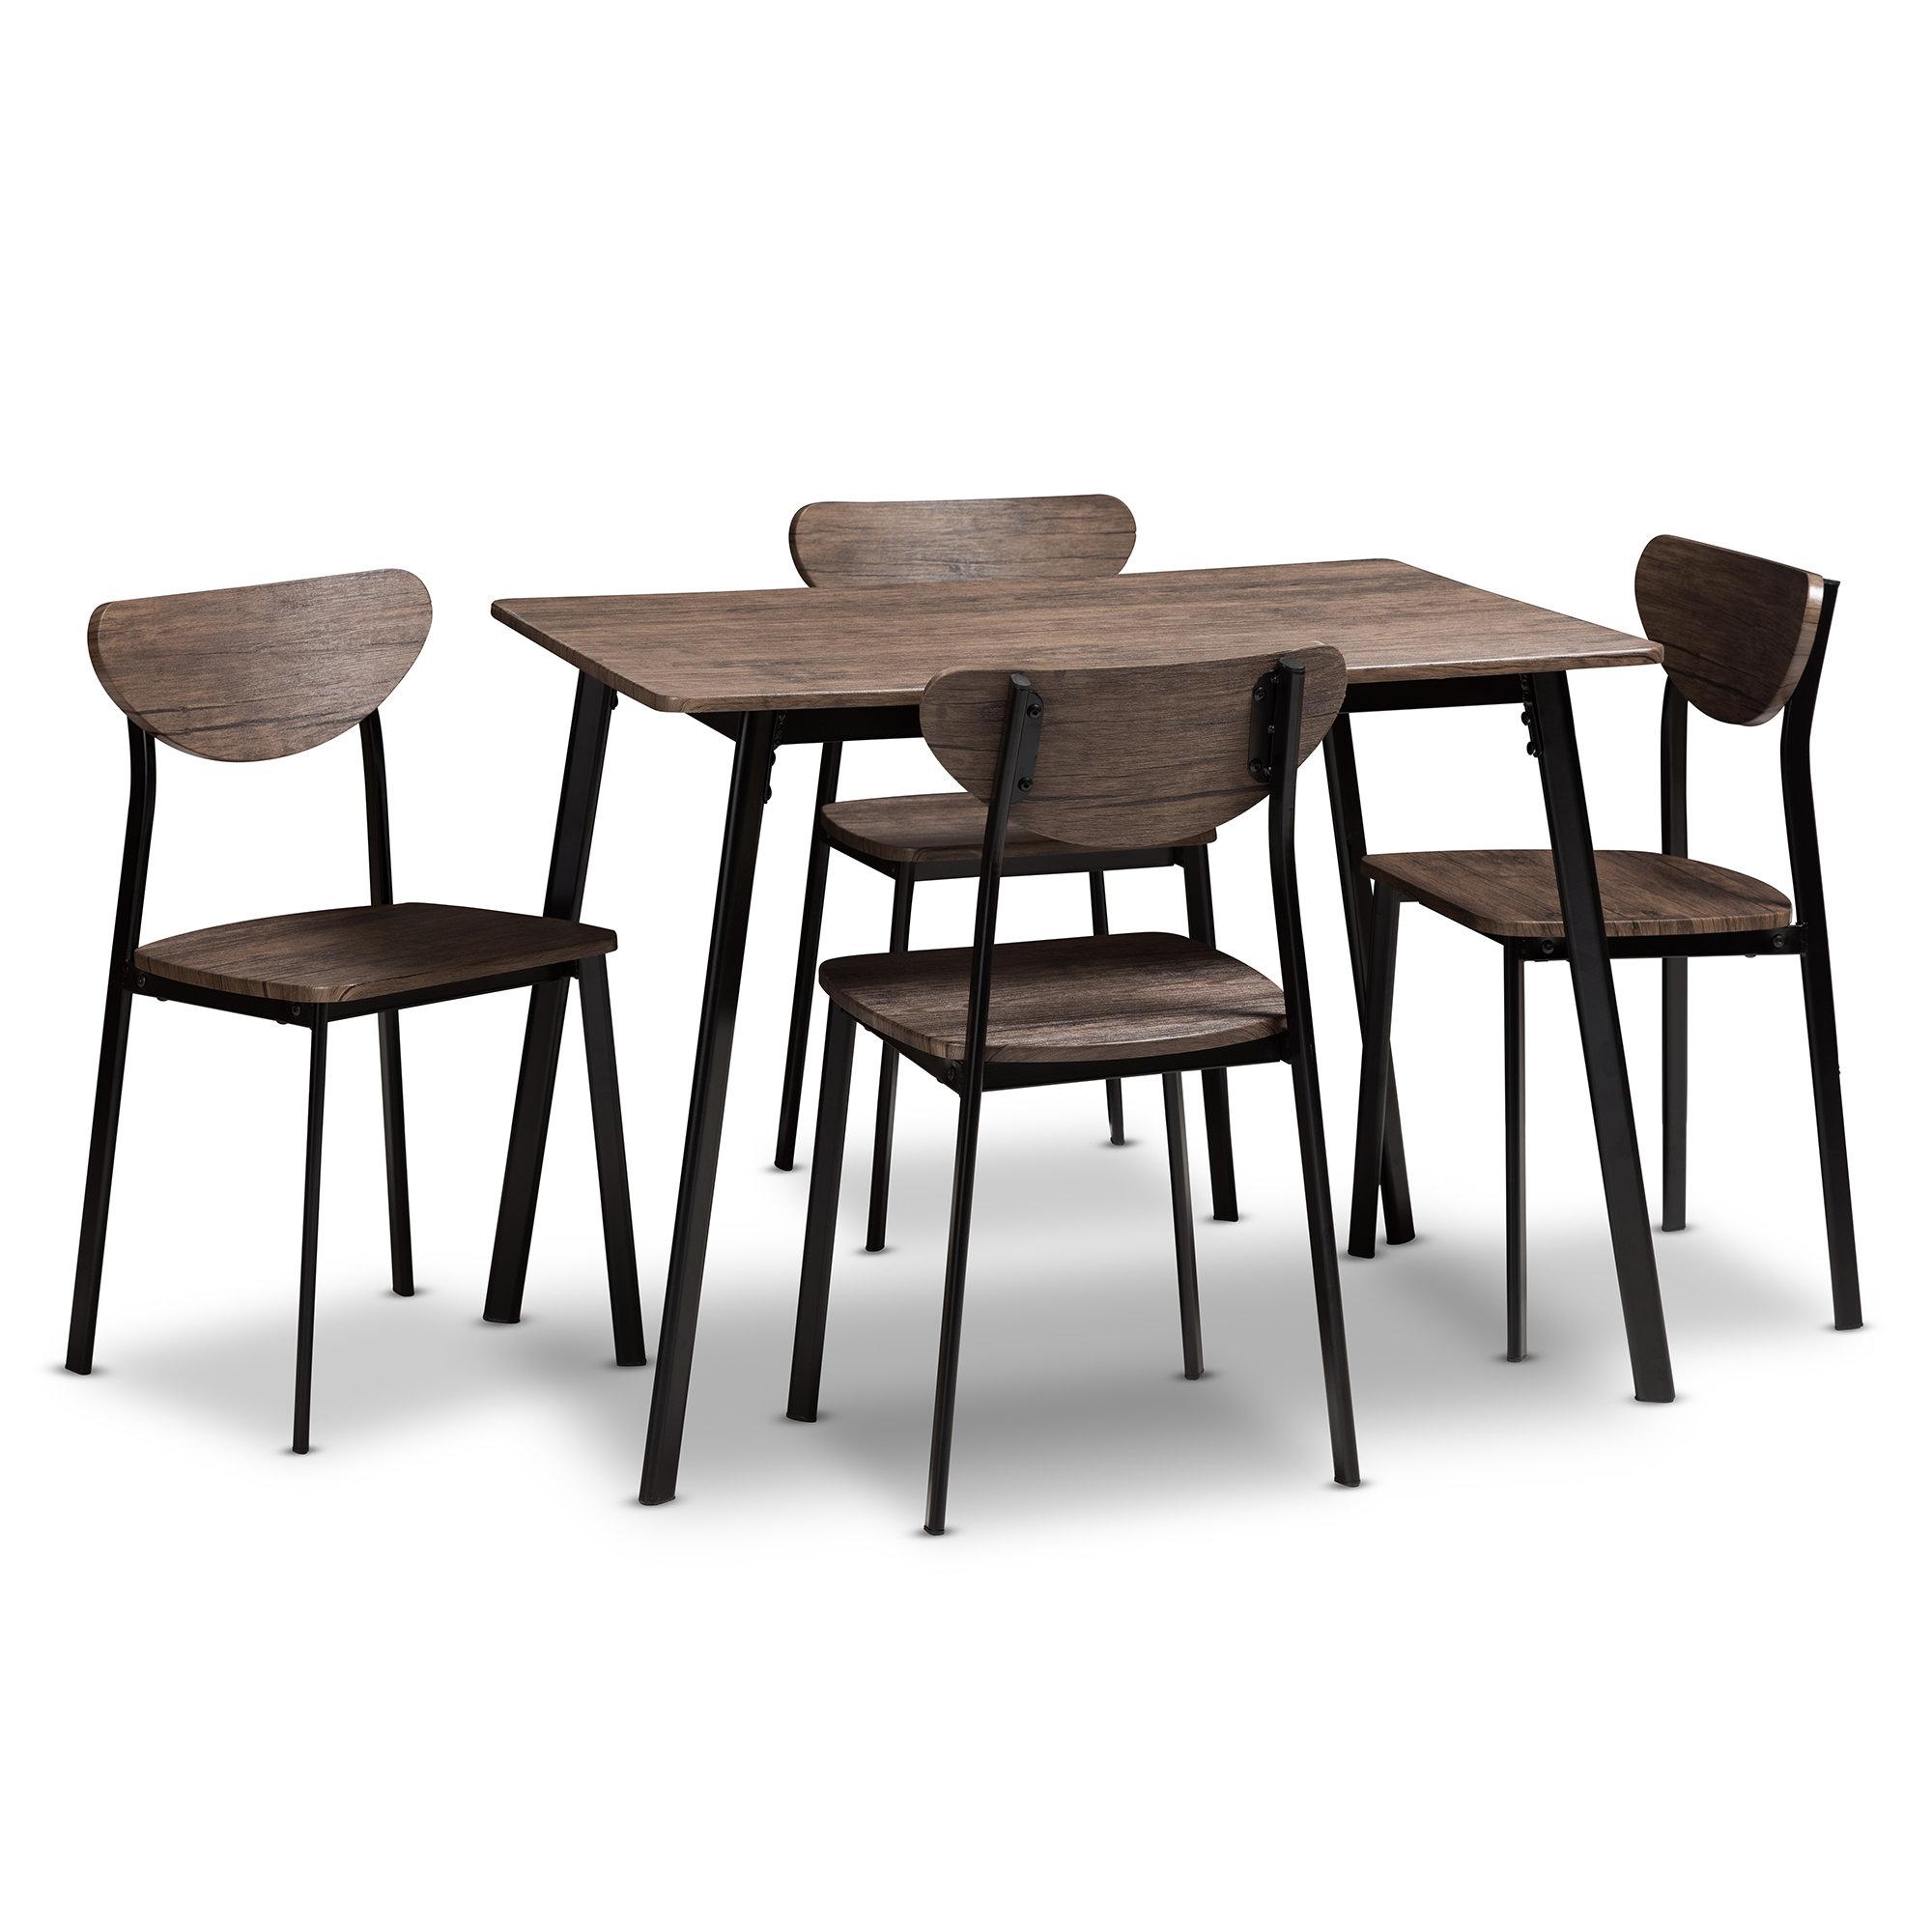 Union Rustic Tejeda 5 Piece Dining Set & Reviews (View 18 of 25)